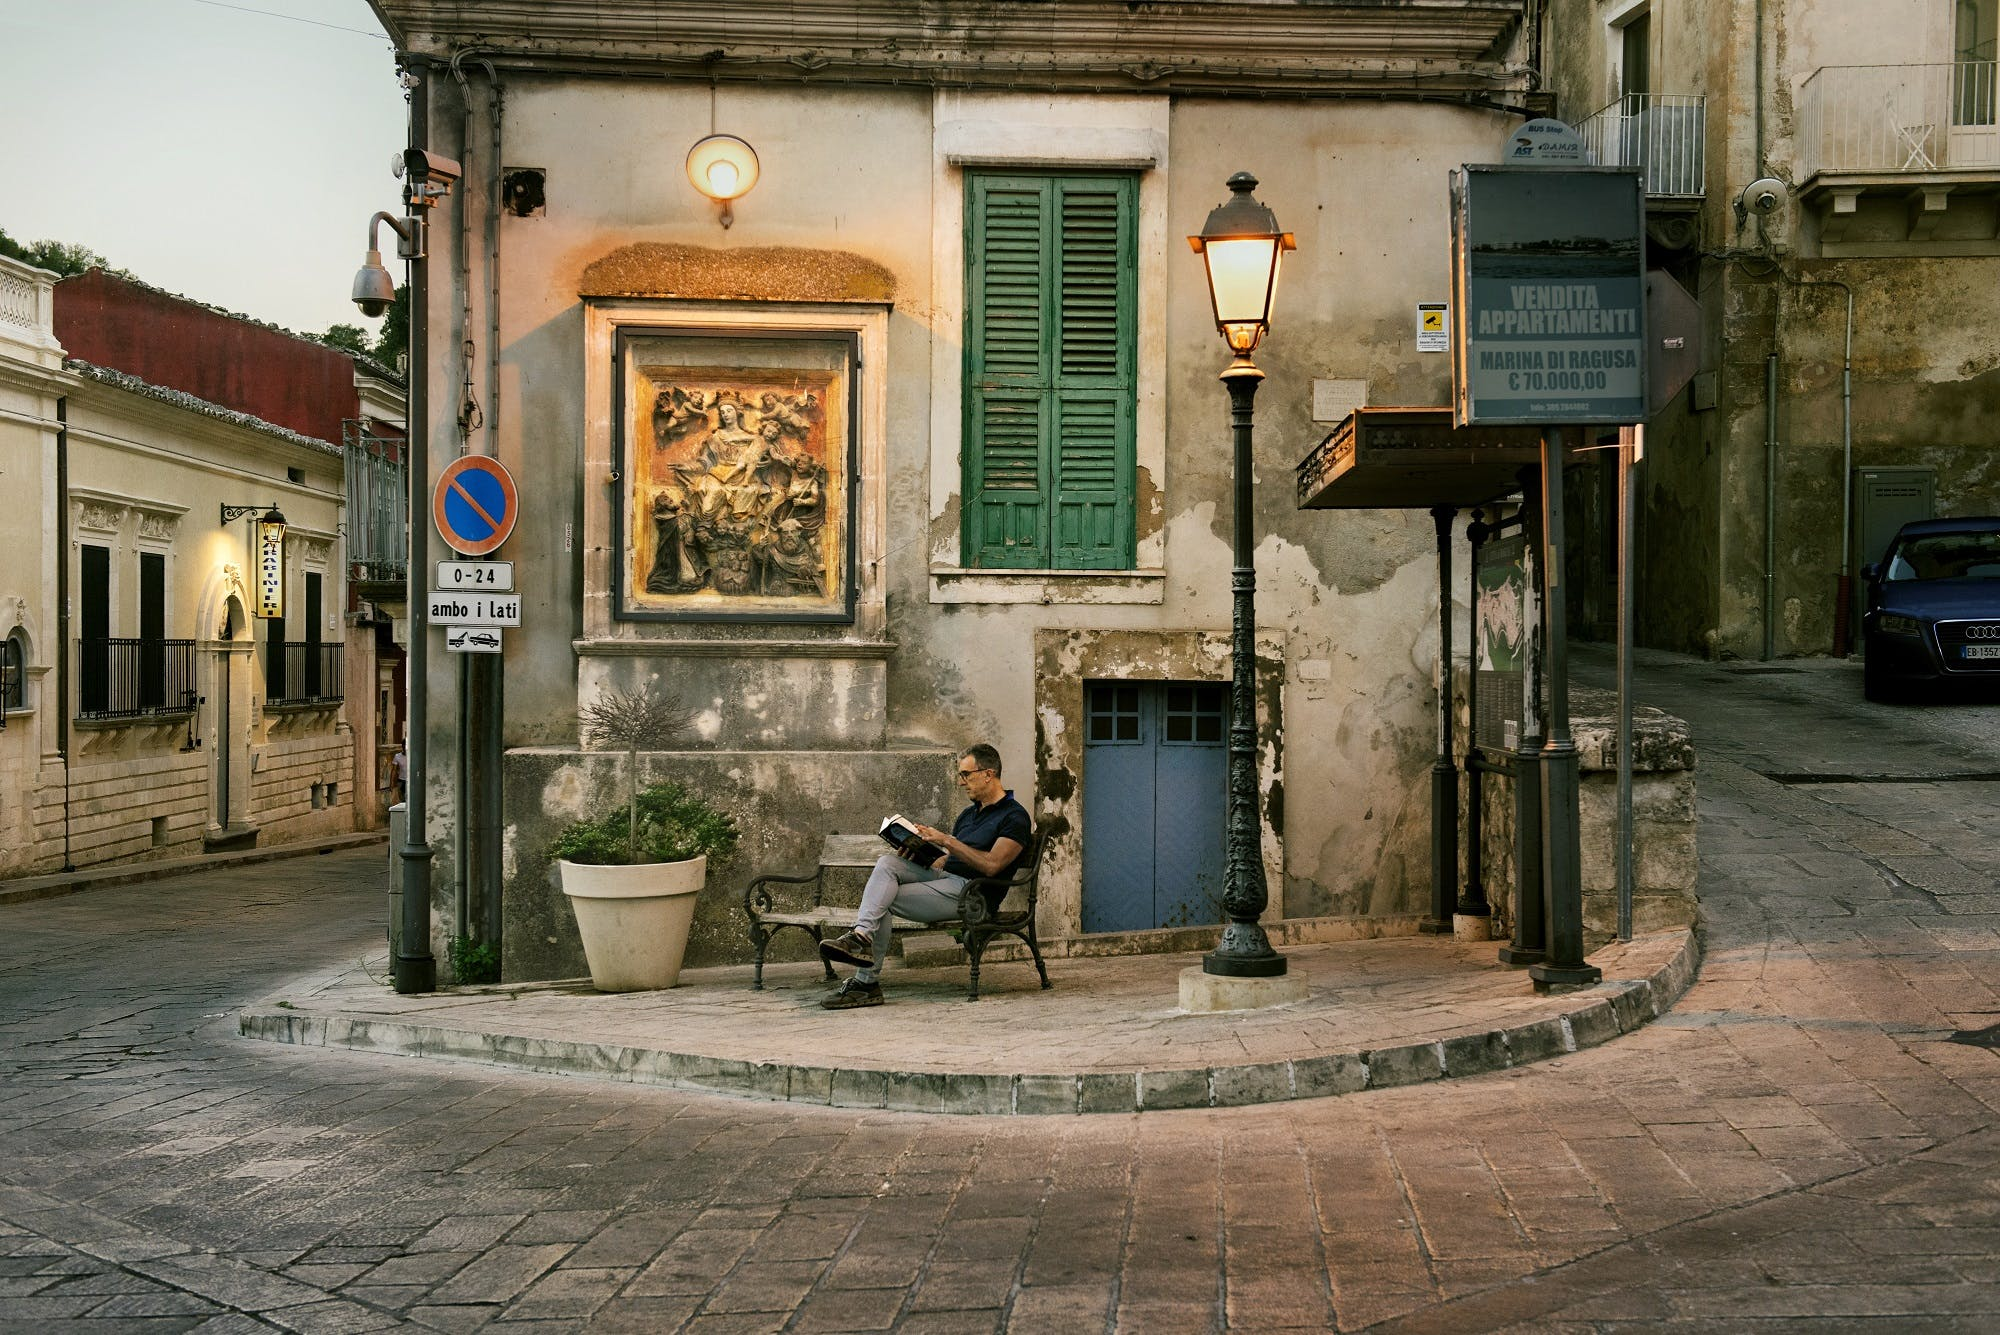 Sicily by Steve McCurry